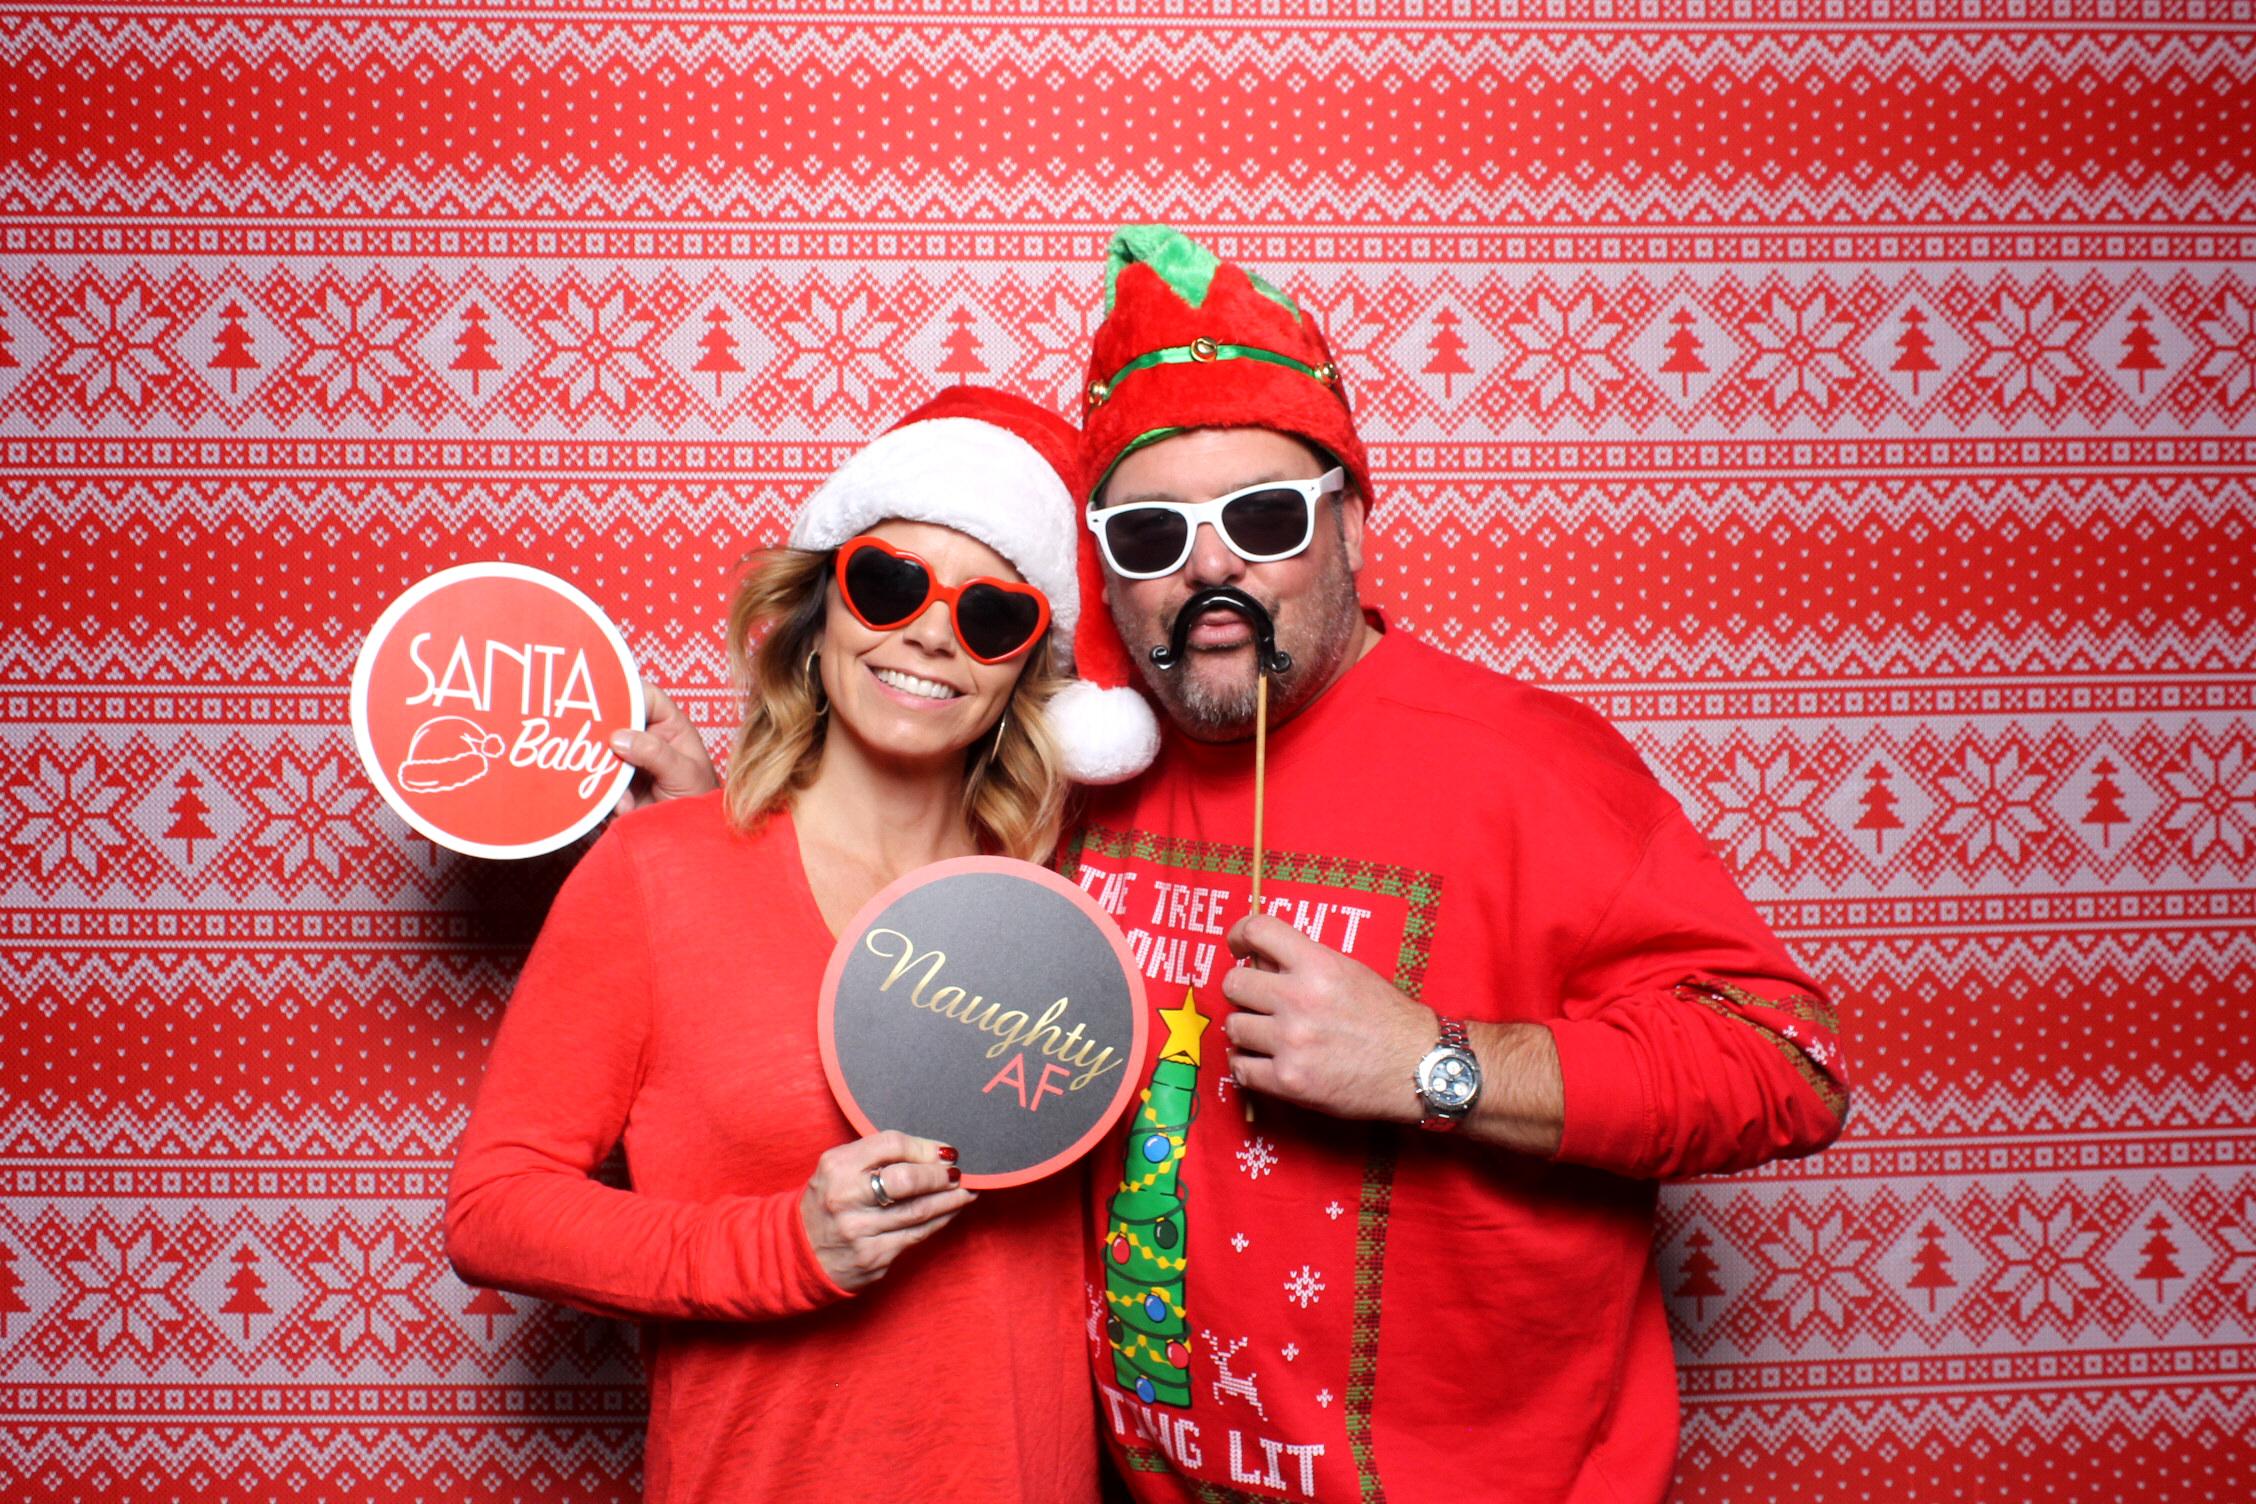 Christmas Photo Booth - Las Vegas